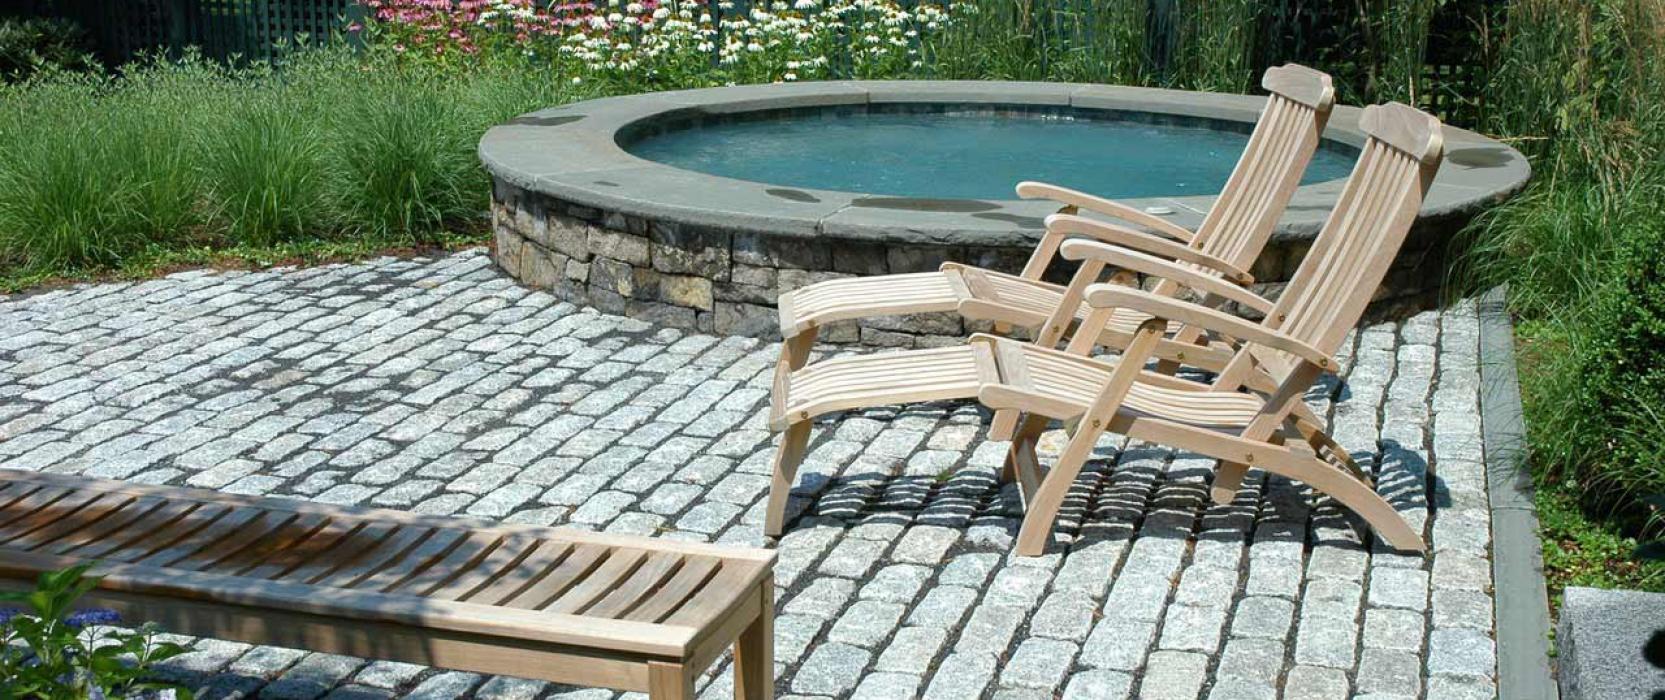 outdoor landscape design and architecture